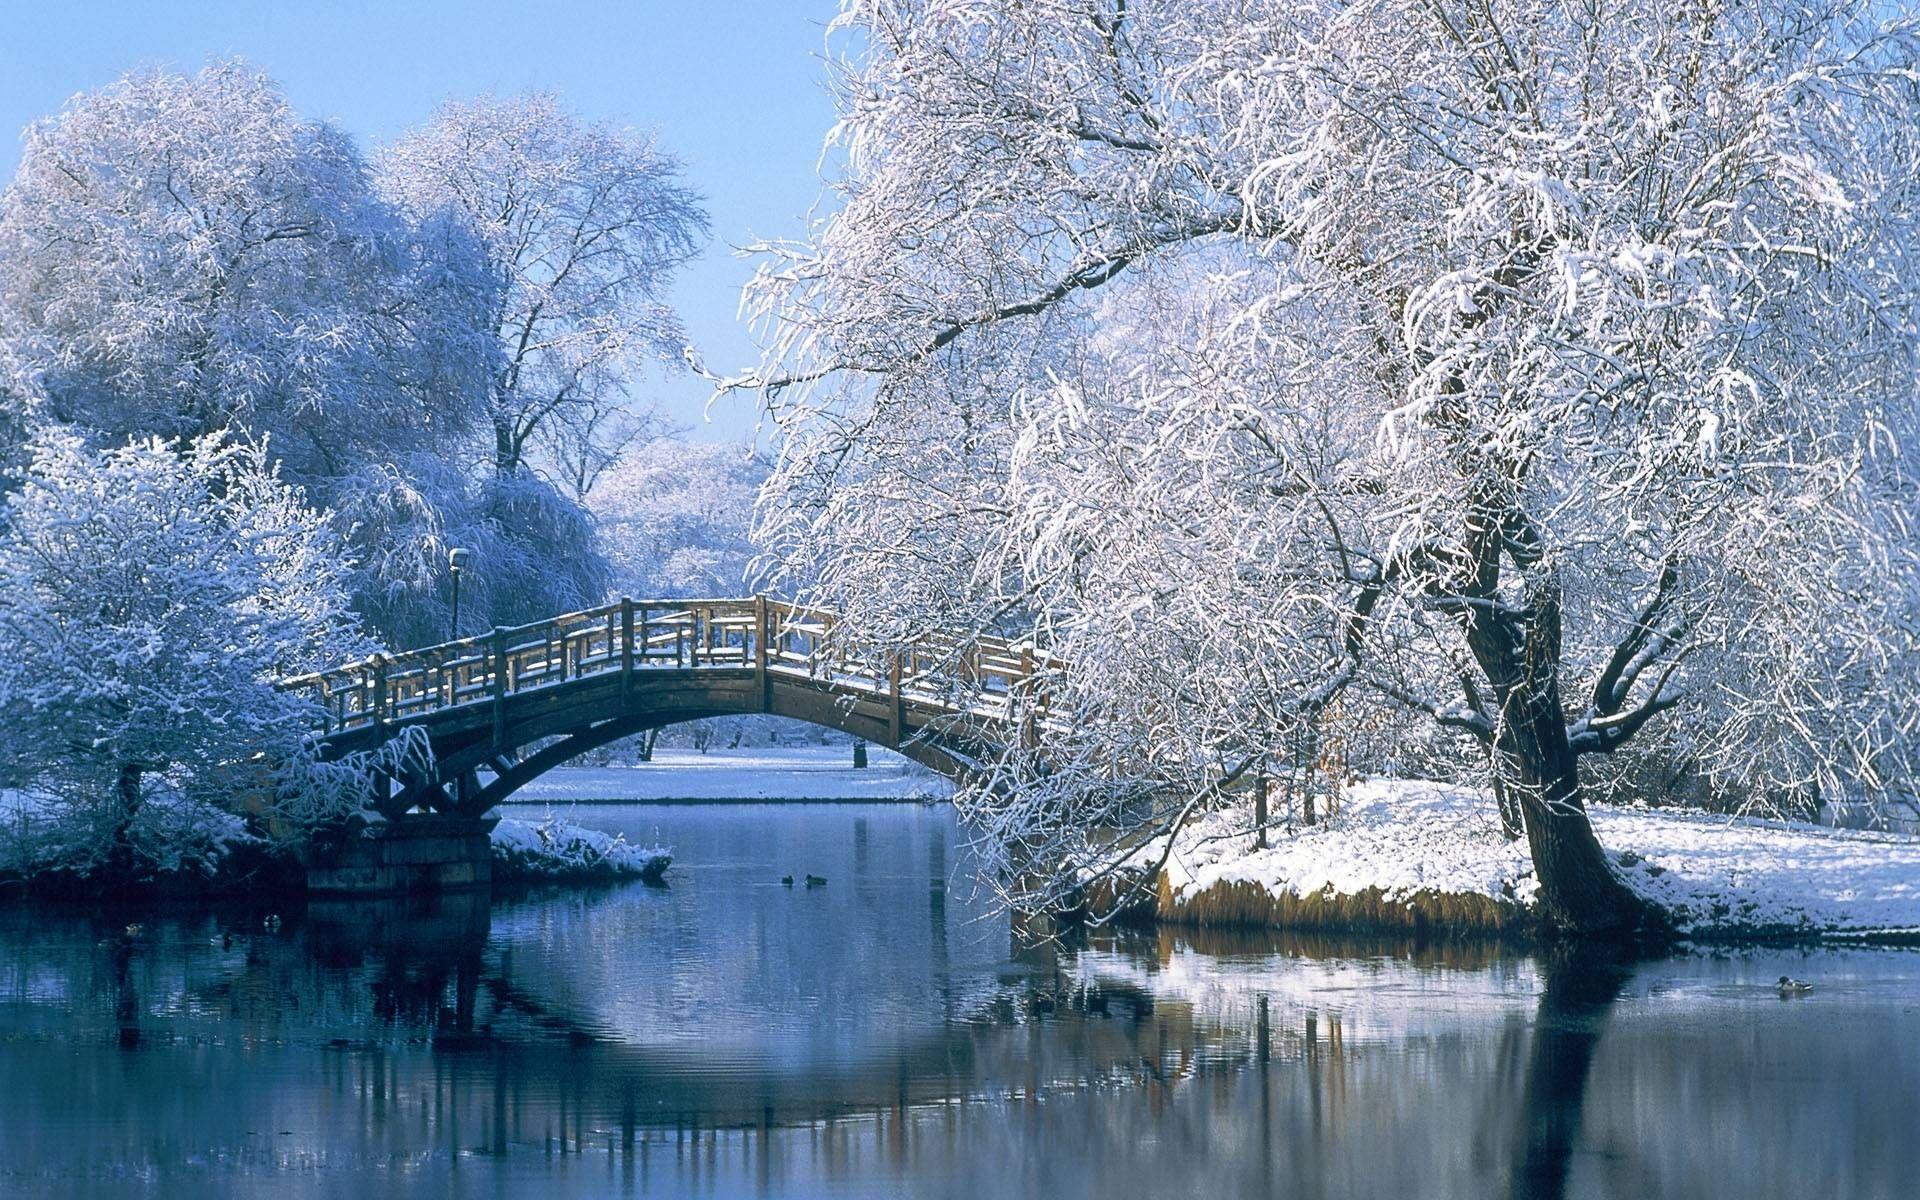 Free Winter Scene Wallpaper Wallpaper Musim Dingin Pemandangan Musim Dingin Wallpaper Alam